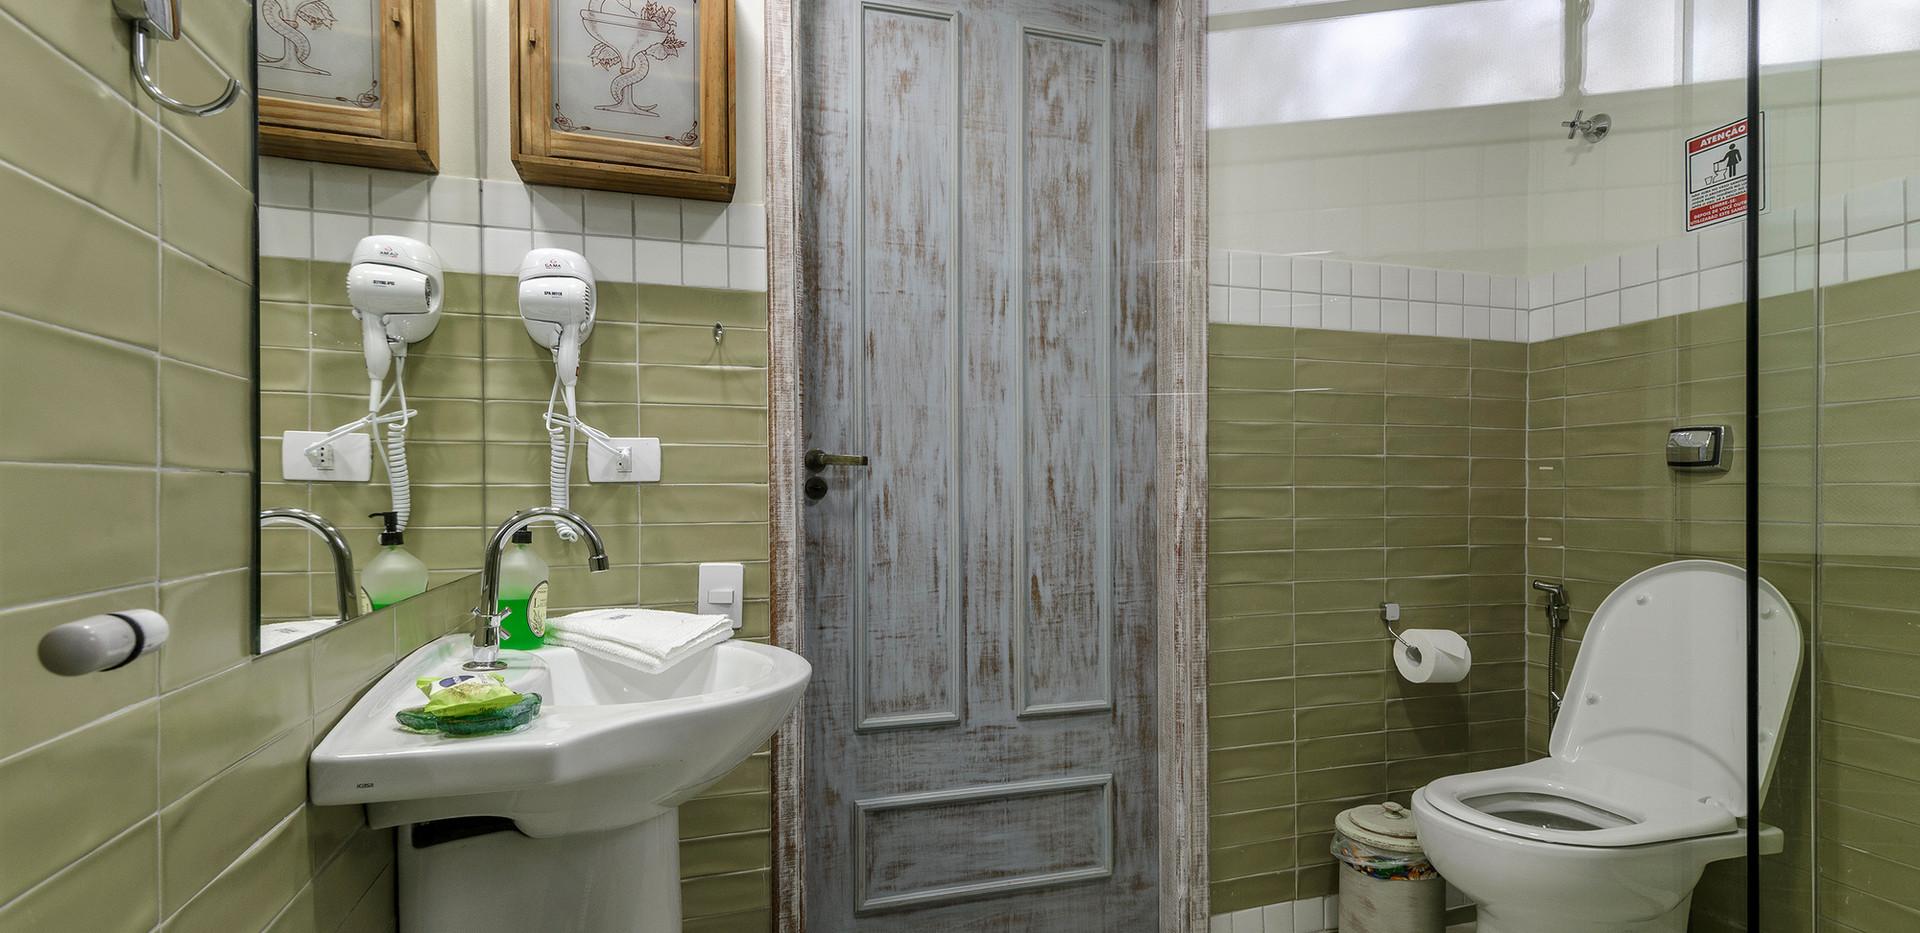 Pousada do Vinhedo - Banheiro Suíte Siva